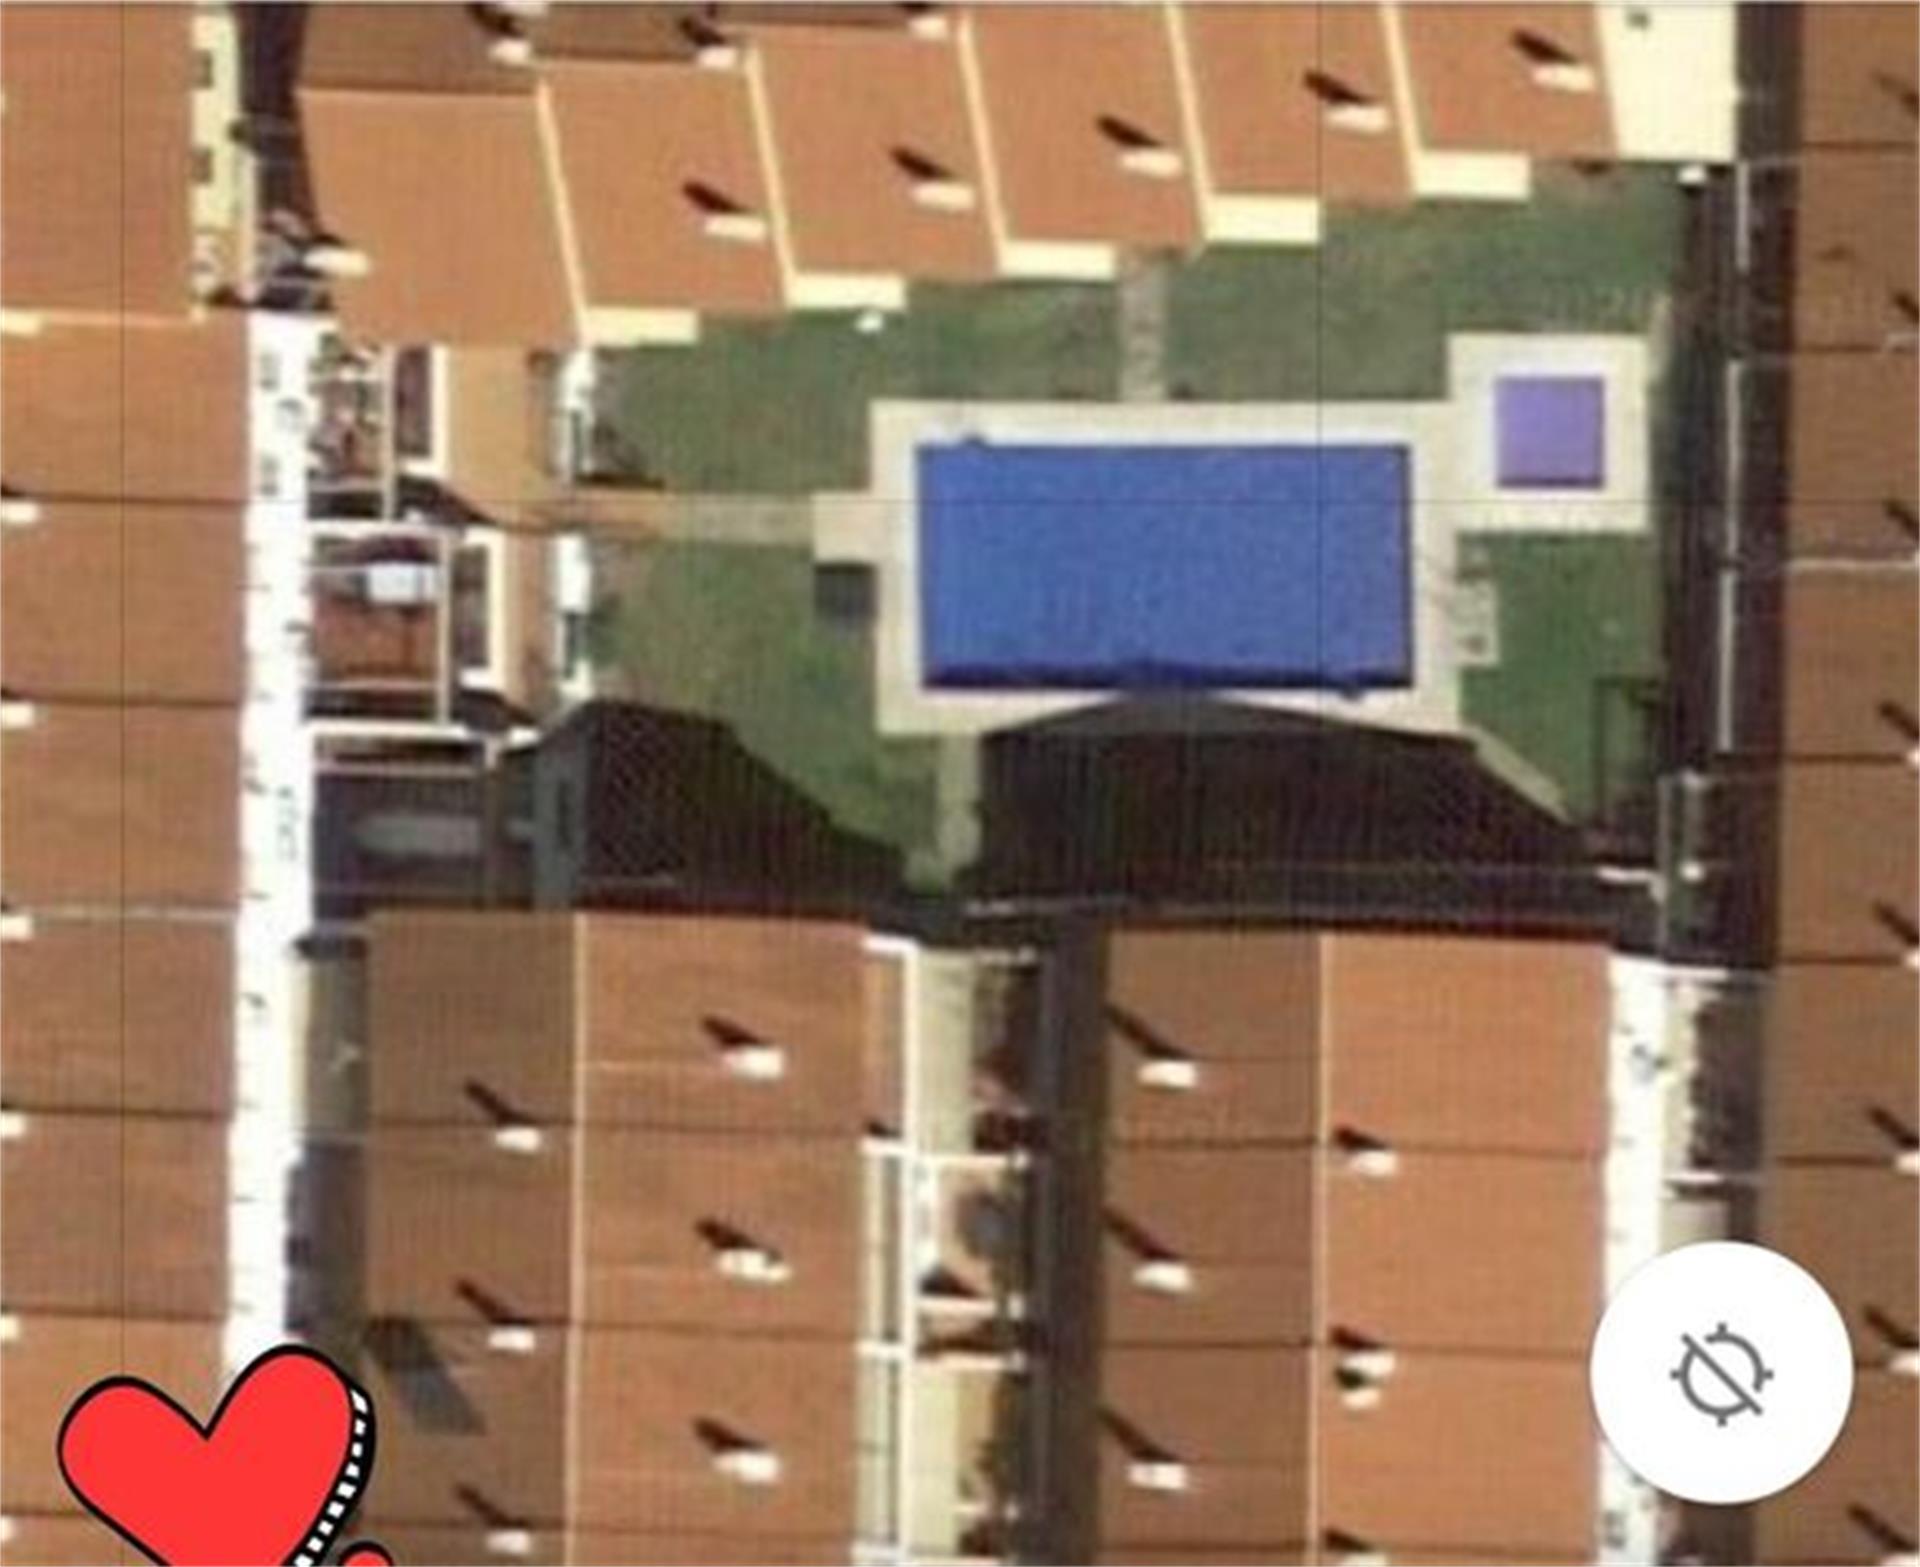 Piso de alquiler en Plaza Mediterraneo Jardines de Alhaurín - Huerta Alta - Fuensanguínea (Alhaurín de la Torre, Málaga)